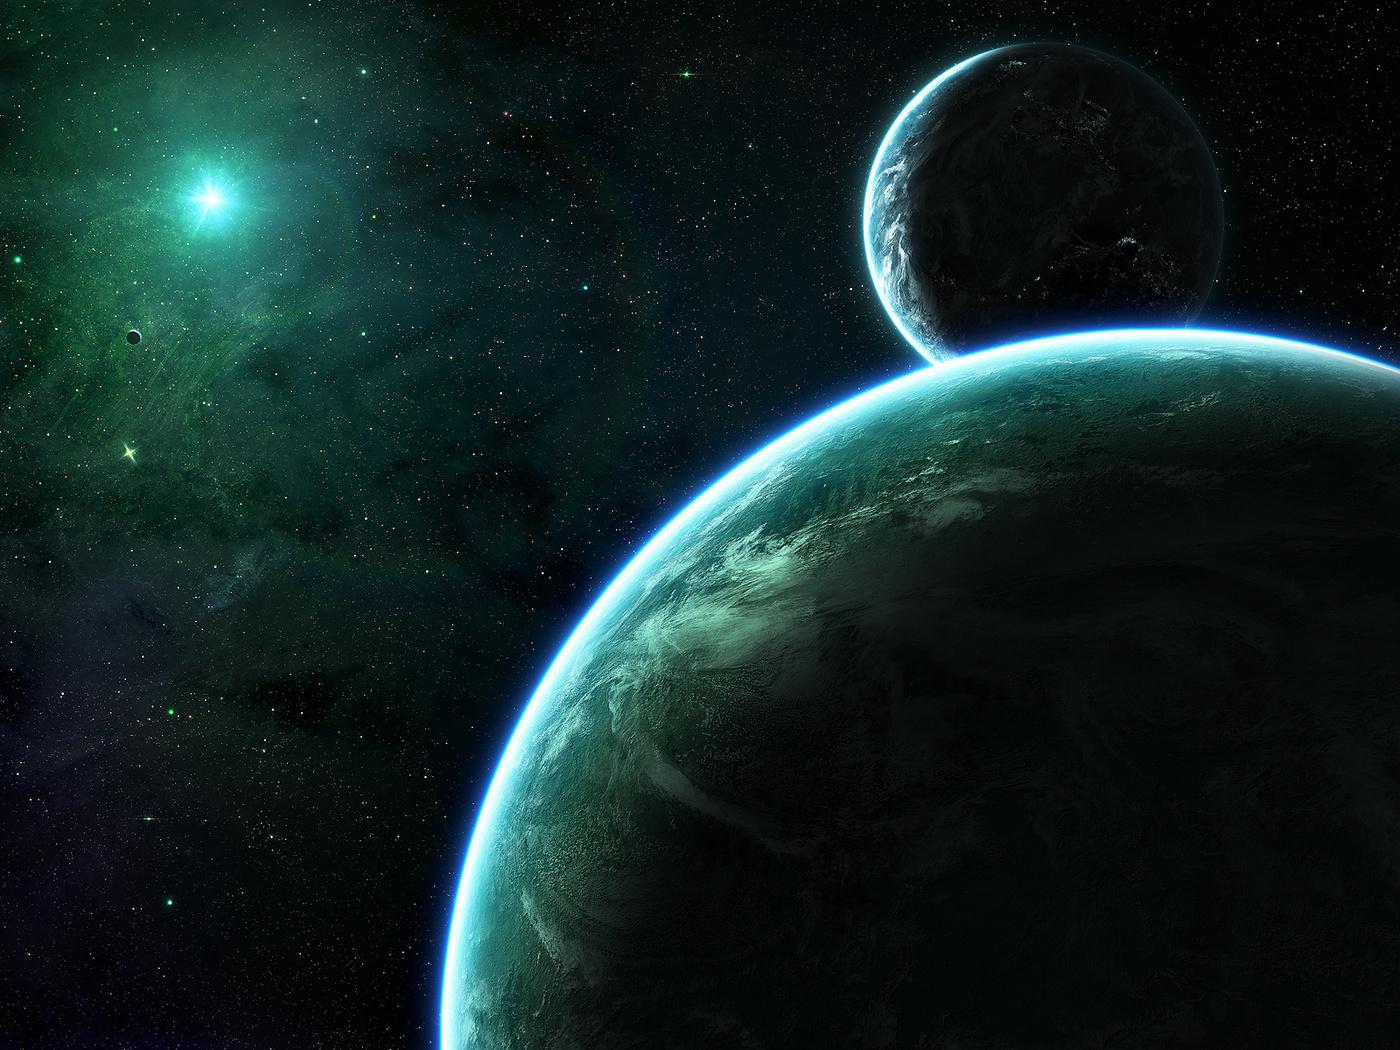 green, shadows, sci fi, darkness, planets, light, Planet, stars